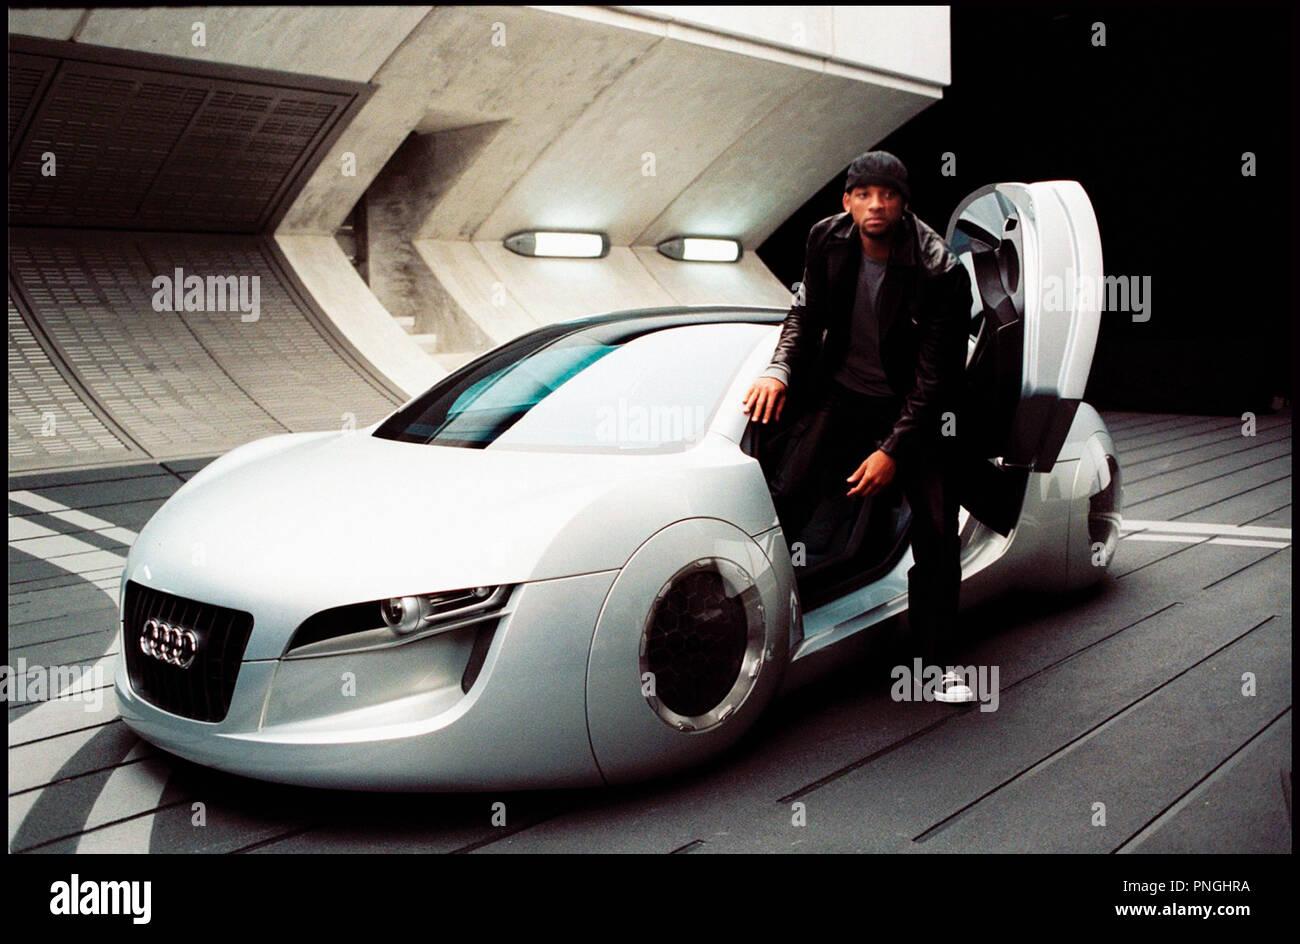 Prod DB © 20th Century Fox - Overbrook Entertainment / DR I, ROBOT (I ROBOT) de Alex Proyas 2004 USA avec Will Smith science fiction, anticipation, futuriste, voiture Audi RSQ, concept-car inspire du livre de Isaac Asimov - Stock Image